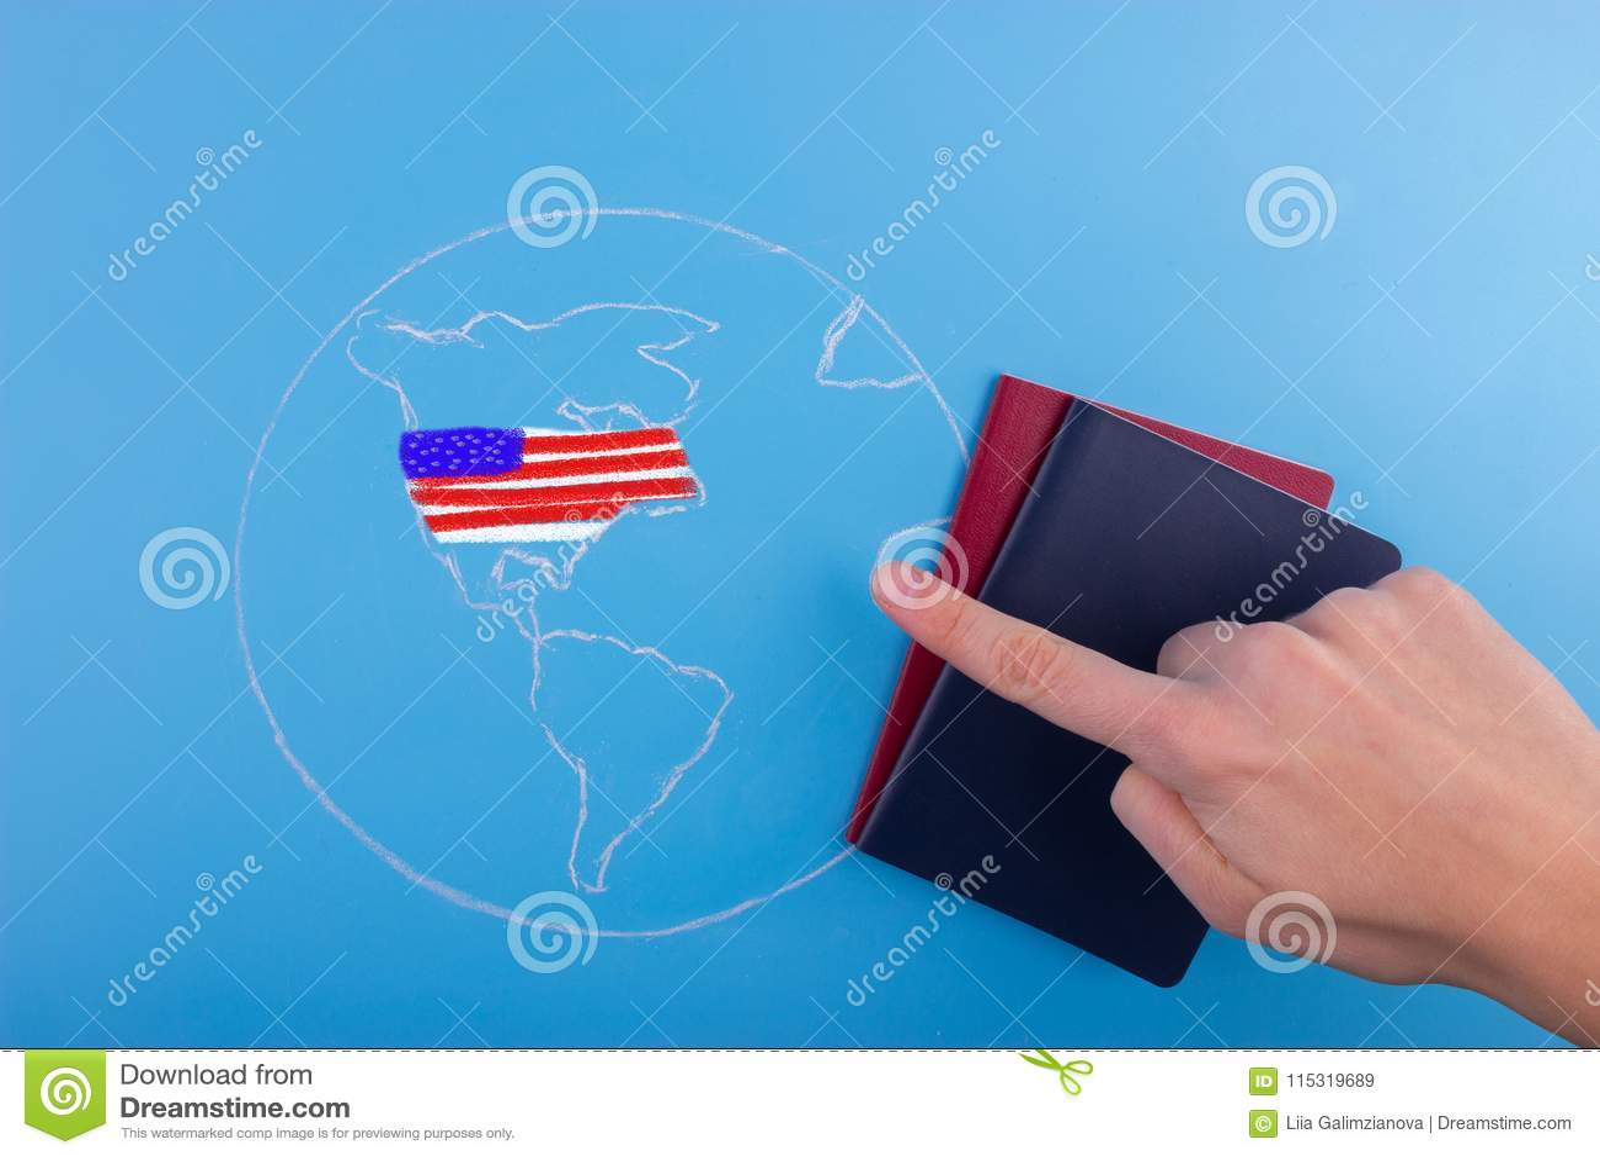 Reise zu USA-Konzept